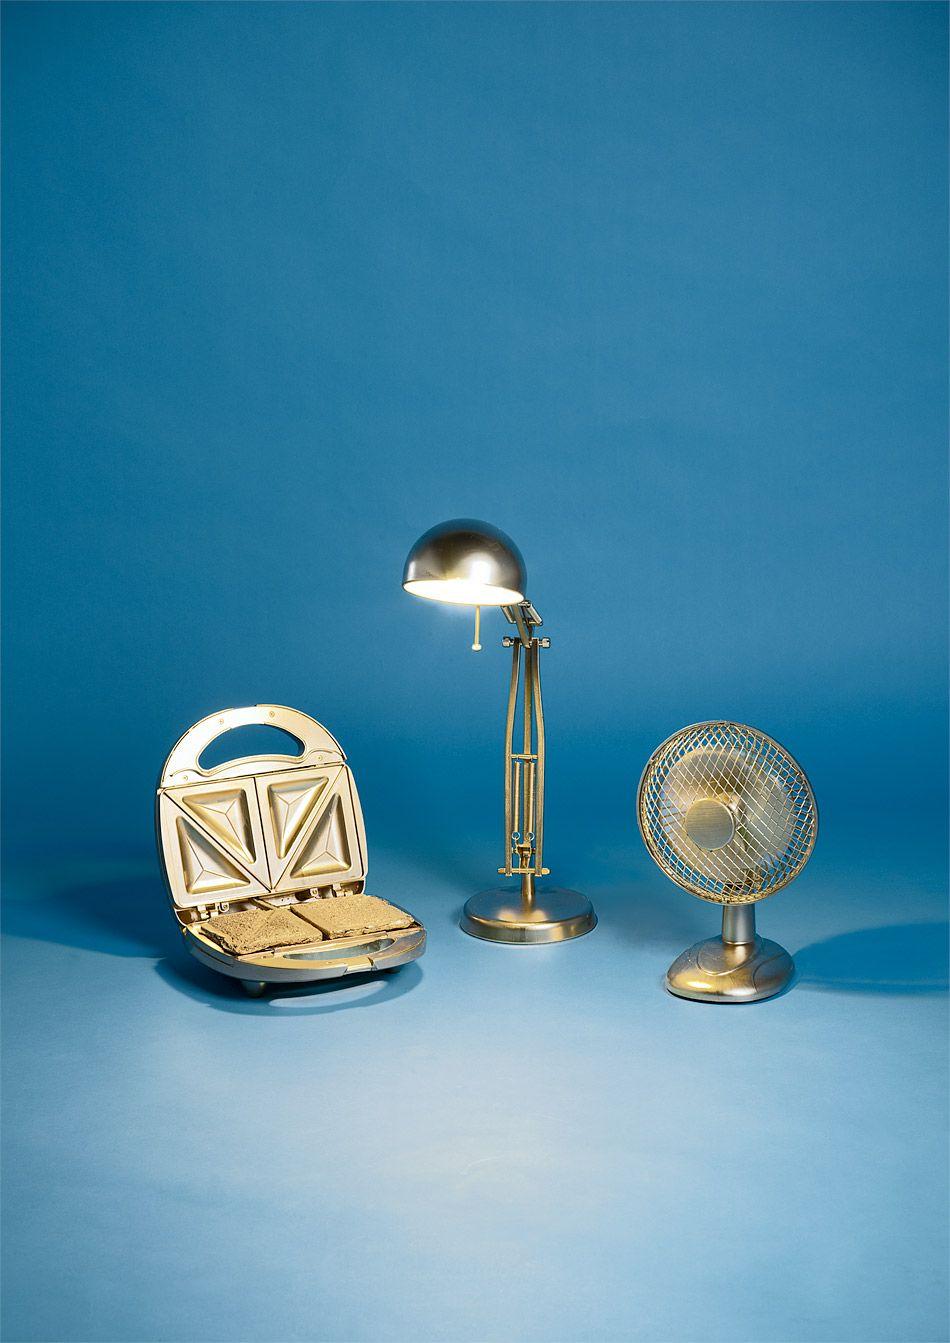 Ziemlich Surprising Design Lampen Badezimmer Fotos - Heimat Ideen ...